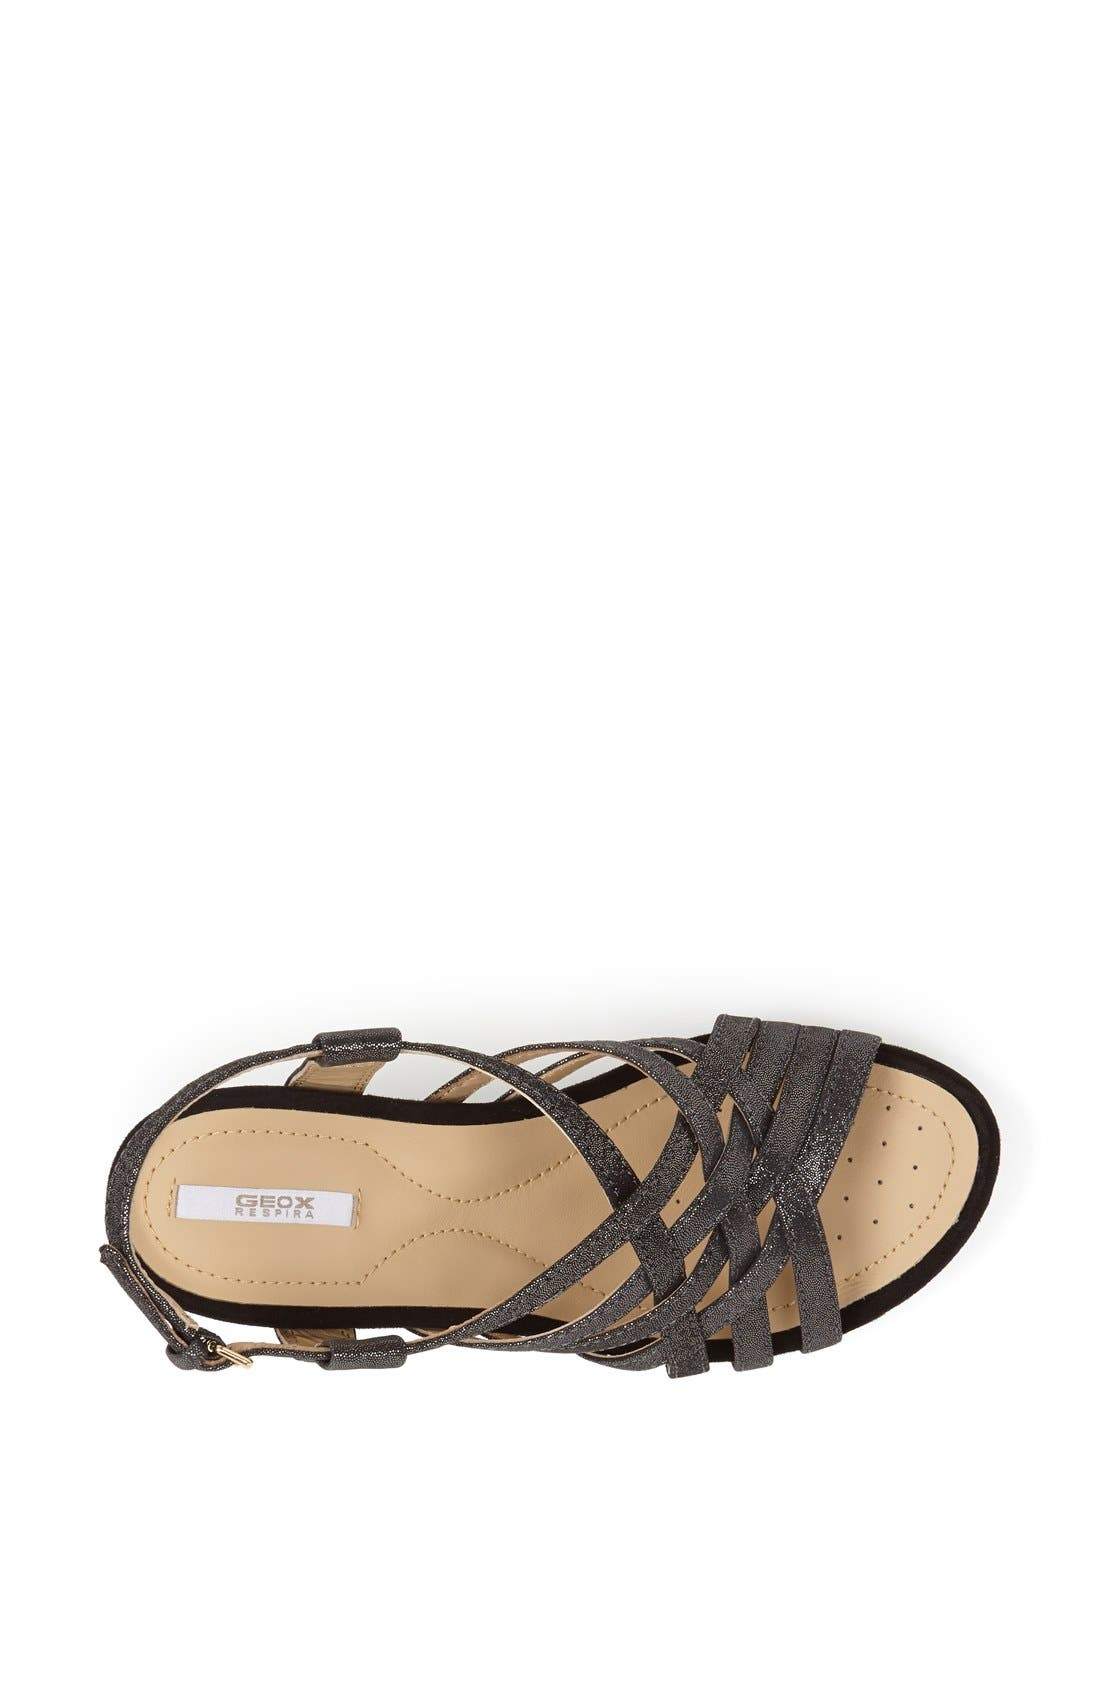 Alternate Image 3  - Geox 'Roxy' Metallic Leather Sandal (Women)